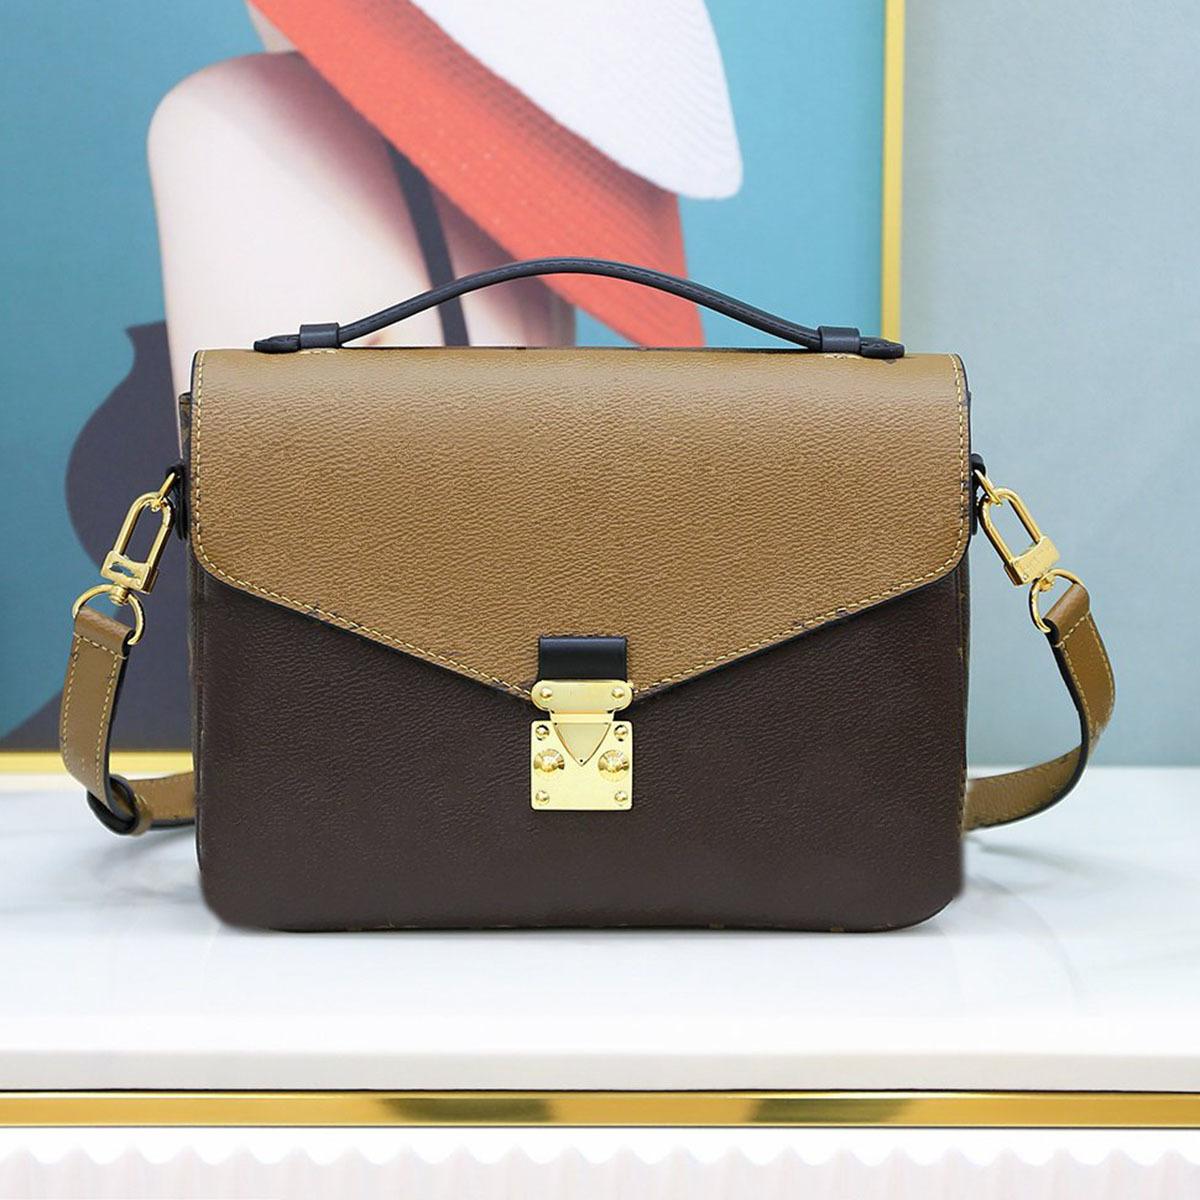 POCHETTE METIS Woman Handbag Bag Date code serial number Quality Leather Women Purse Messenger Shoulder Bags